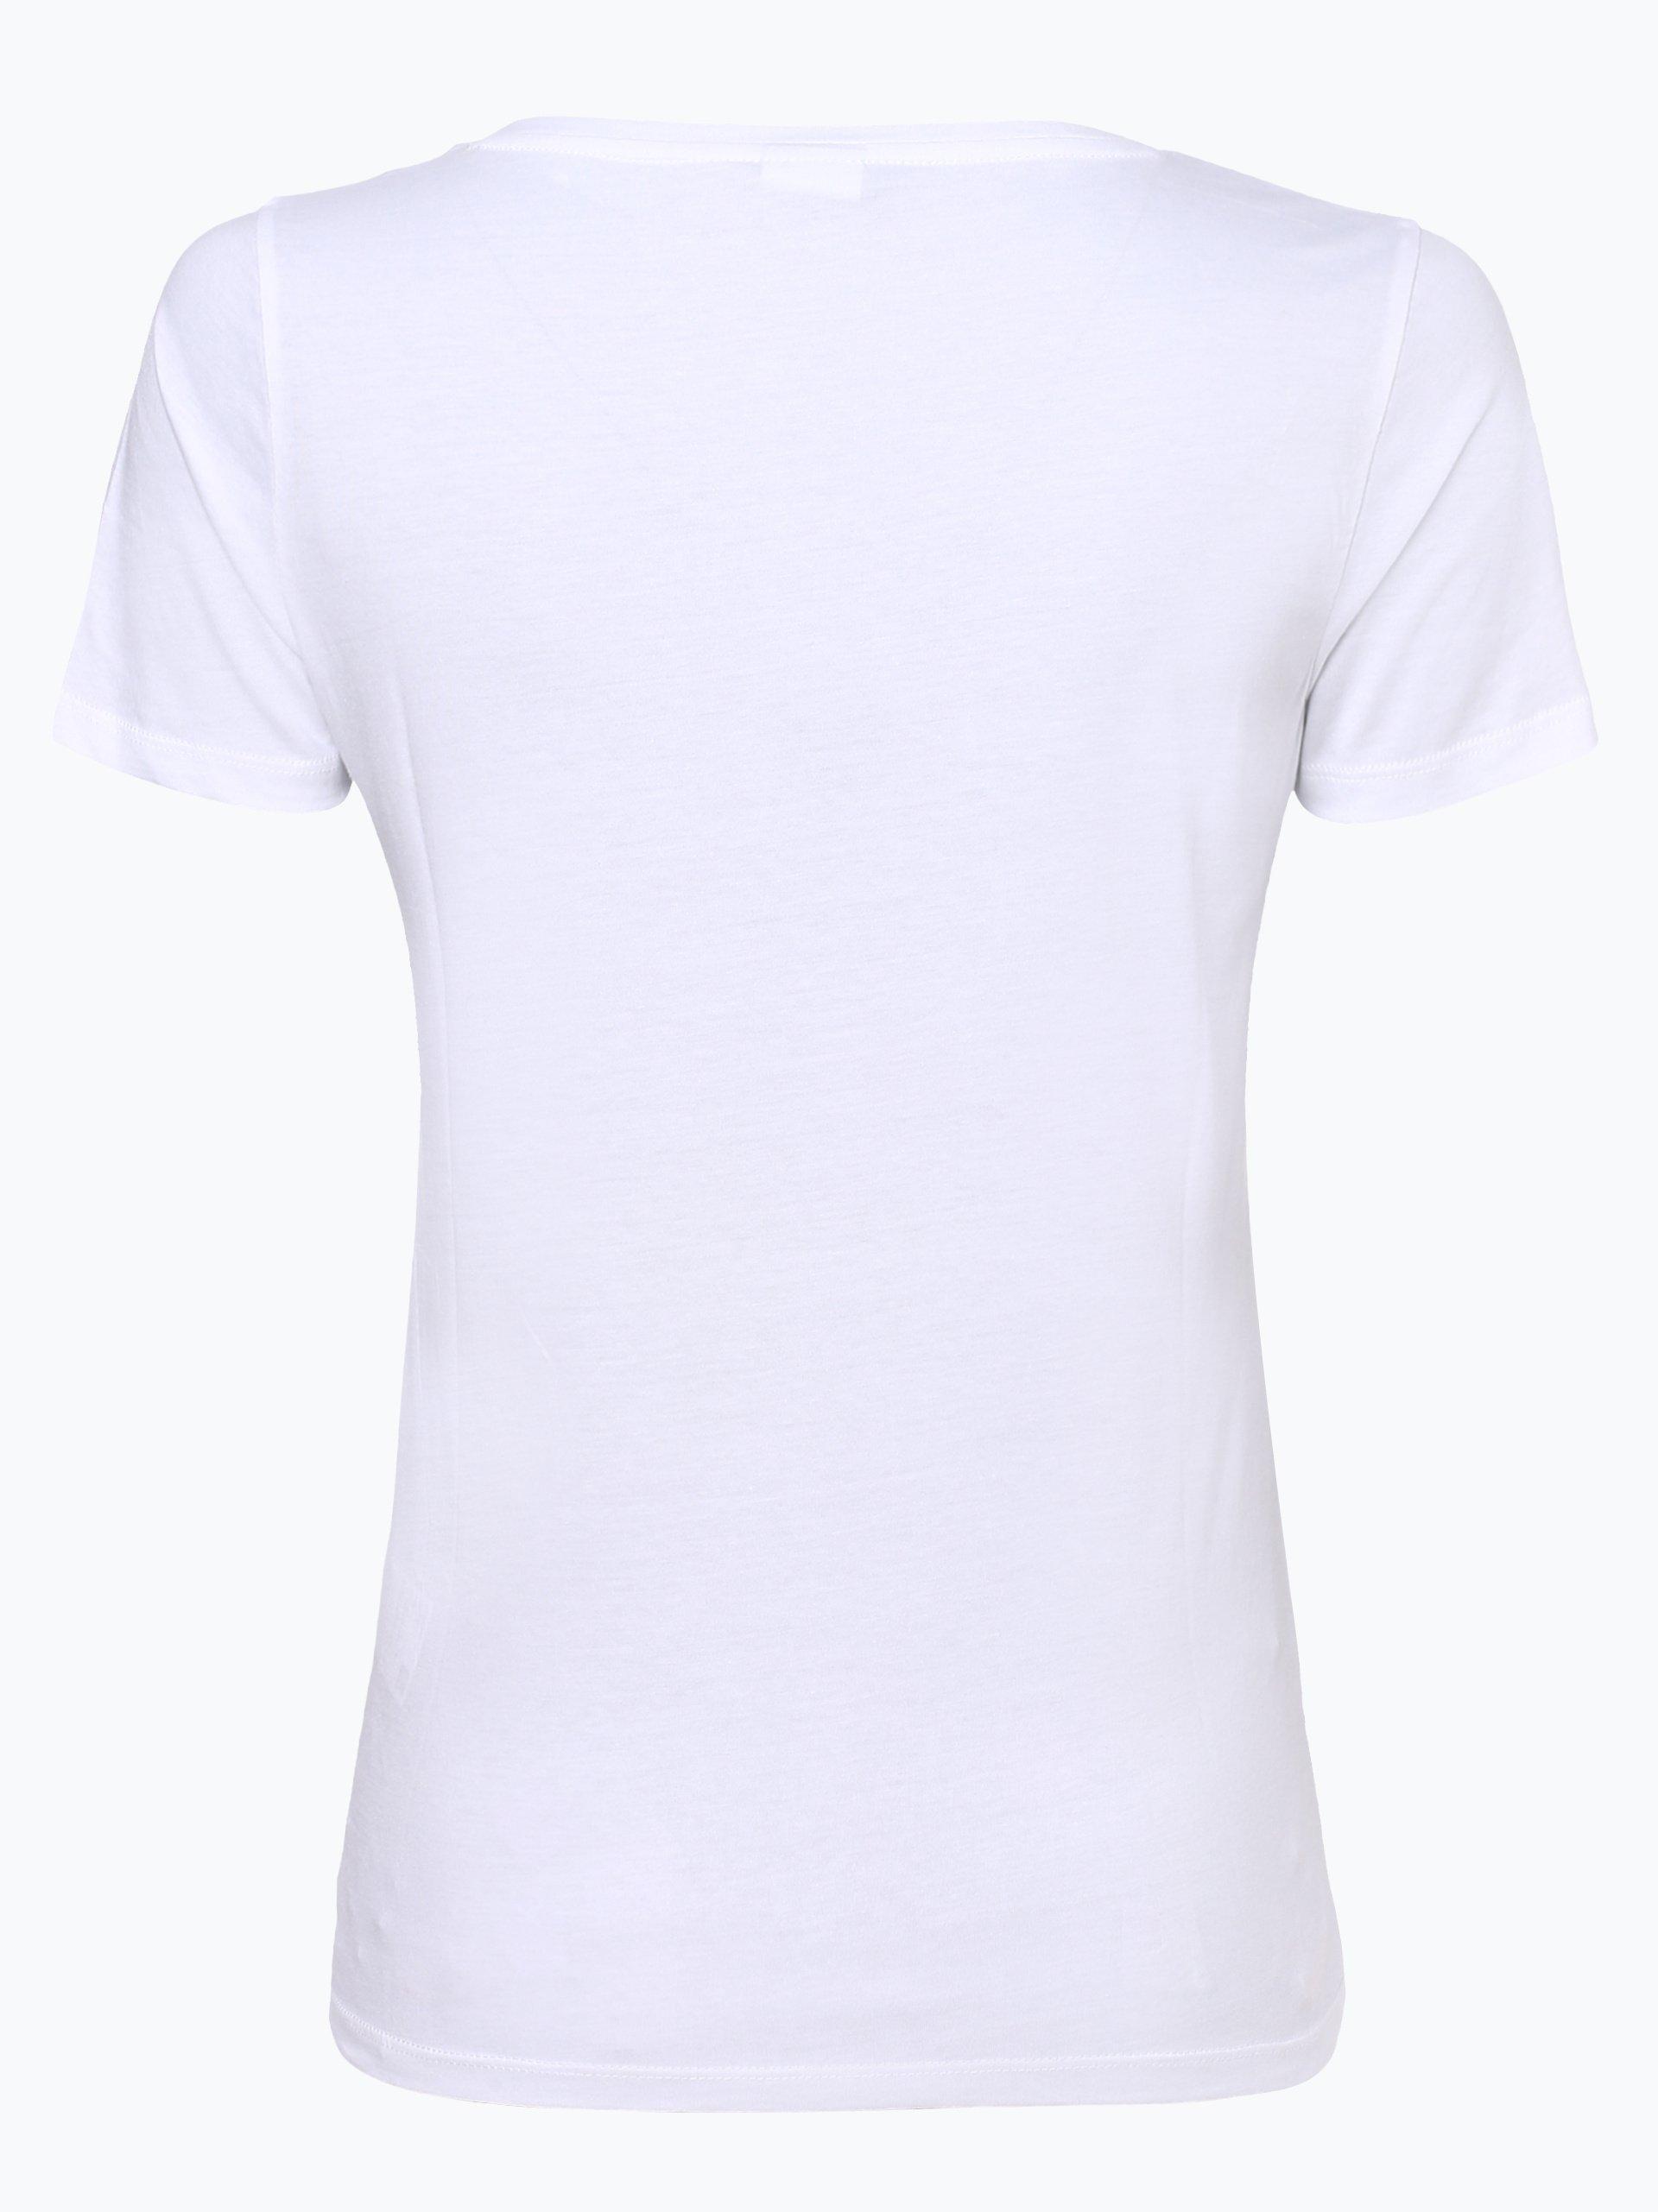 BOSS Casual Damen T-Shirt - Teslogan